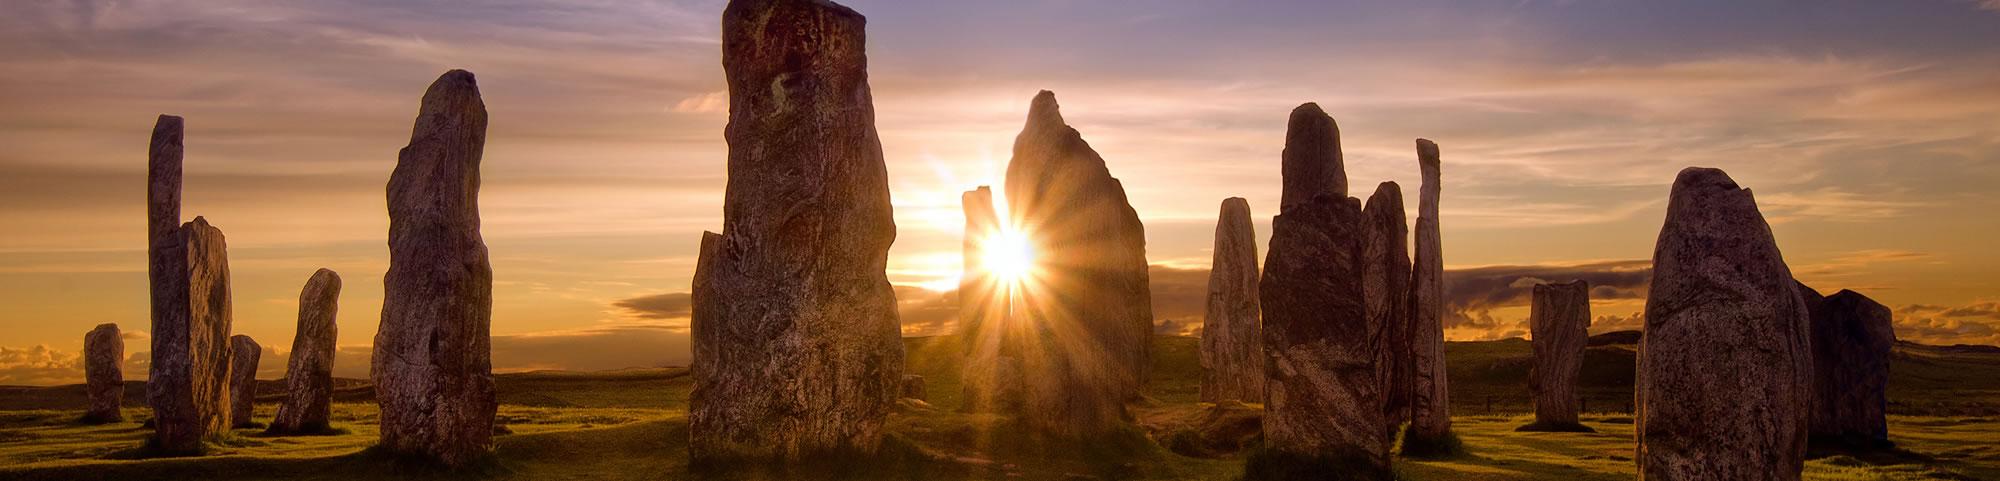 Callanish stone circle, Outer Hebrides